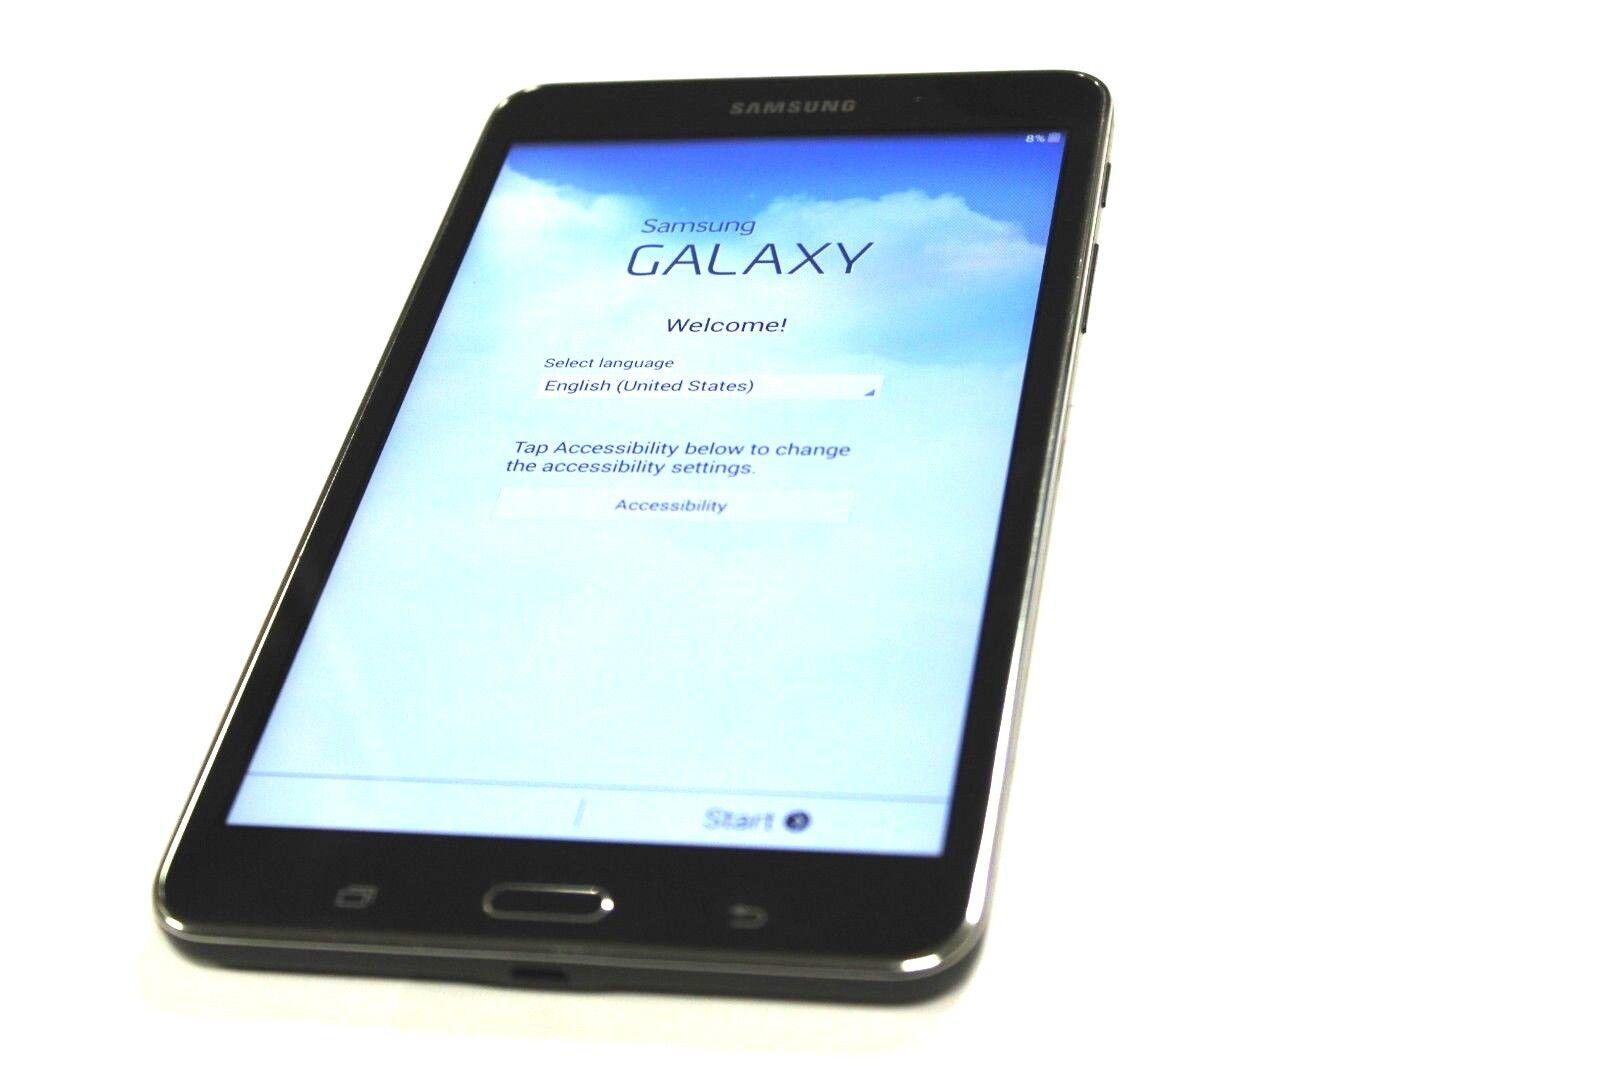 "SAMSUNG Galaxy Tab 4 Nook Edition 7"" 8GB Wi-Fi Tablet SM-T230NU - Black"